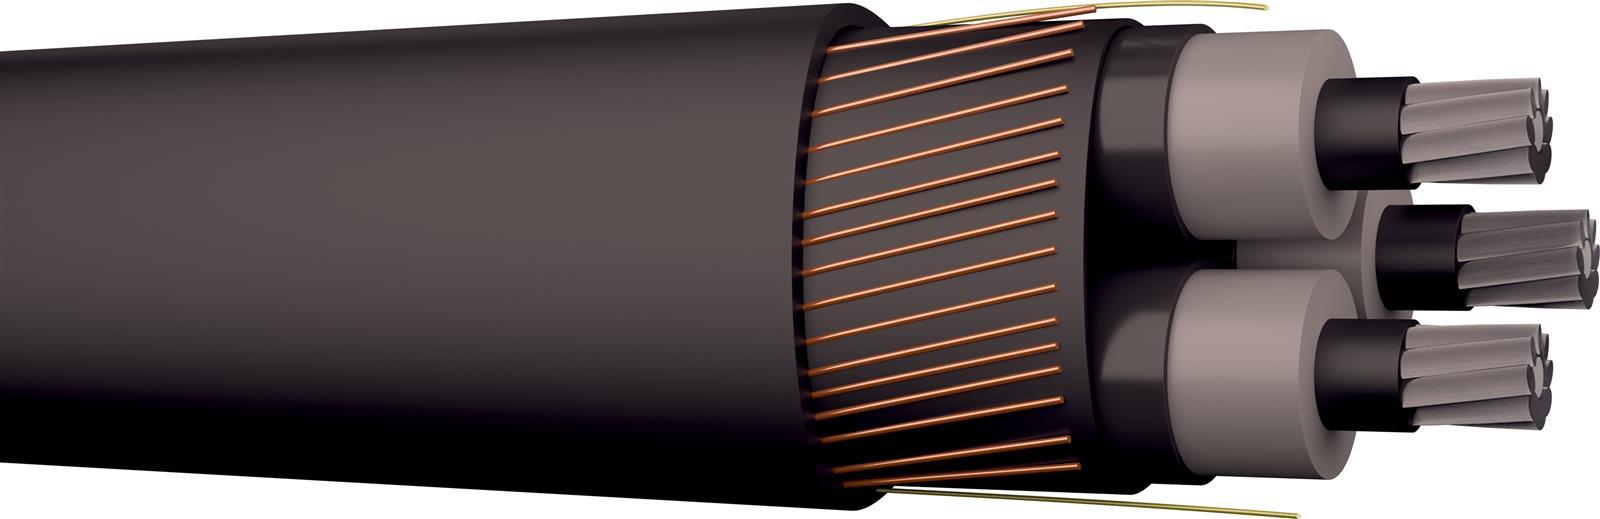 AXQJ-RMF PURE 3X240/35 24KV T5